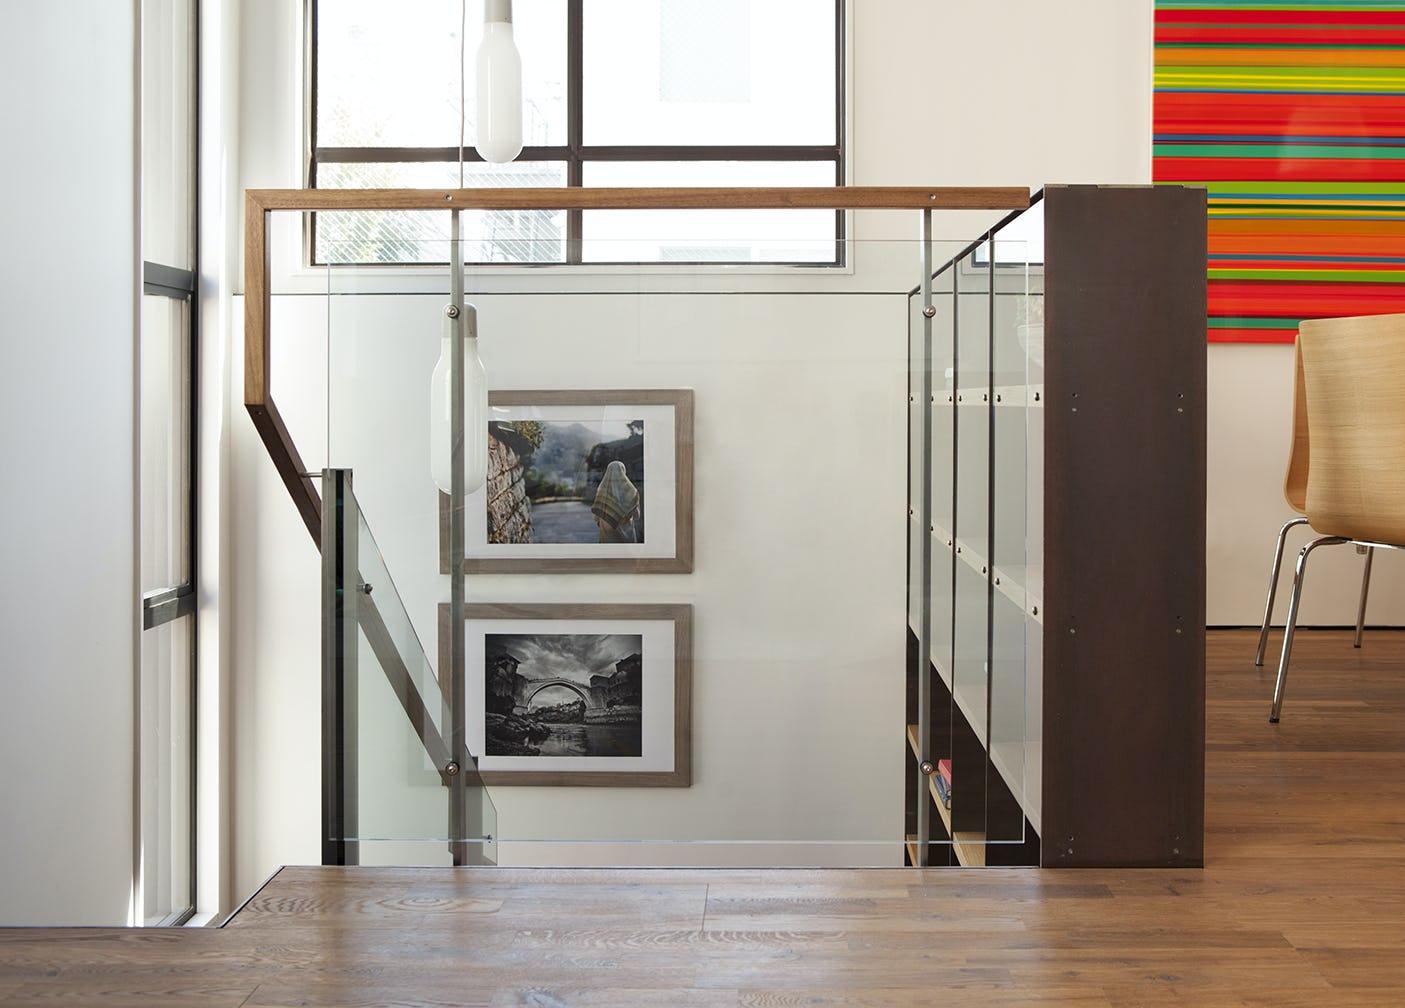 Builtform construction  steelhouse1 2 stairs wood glass detail modern